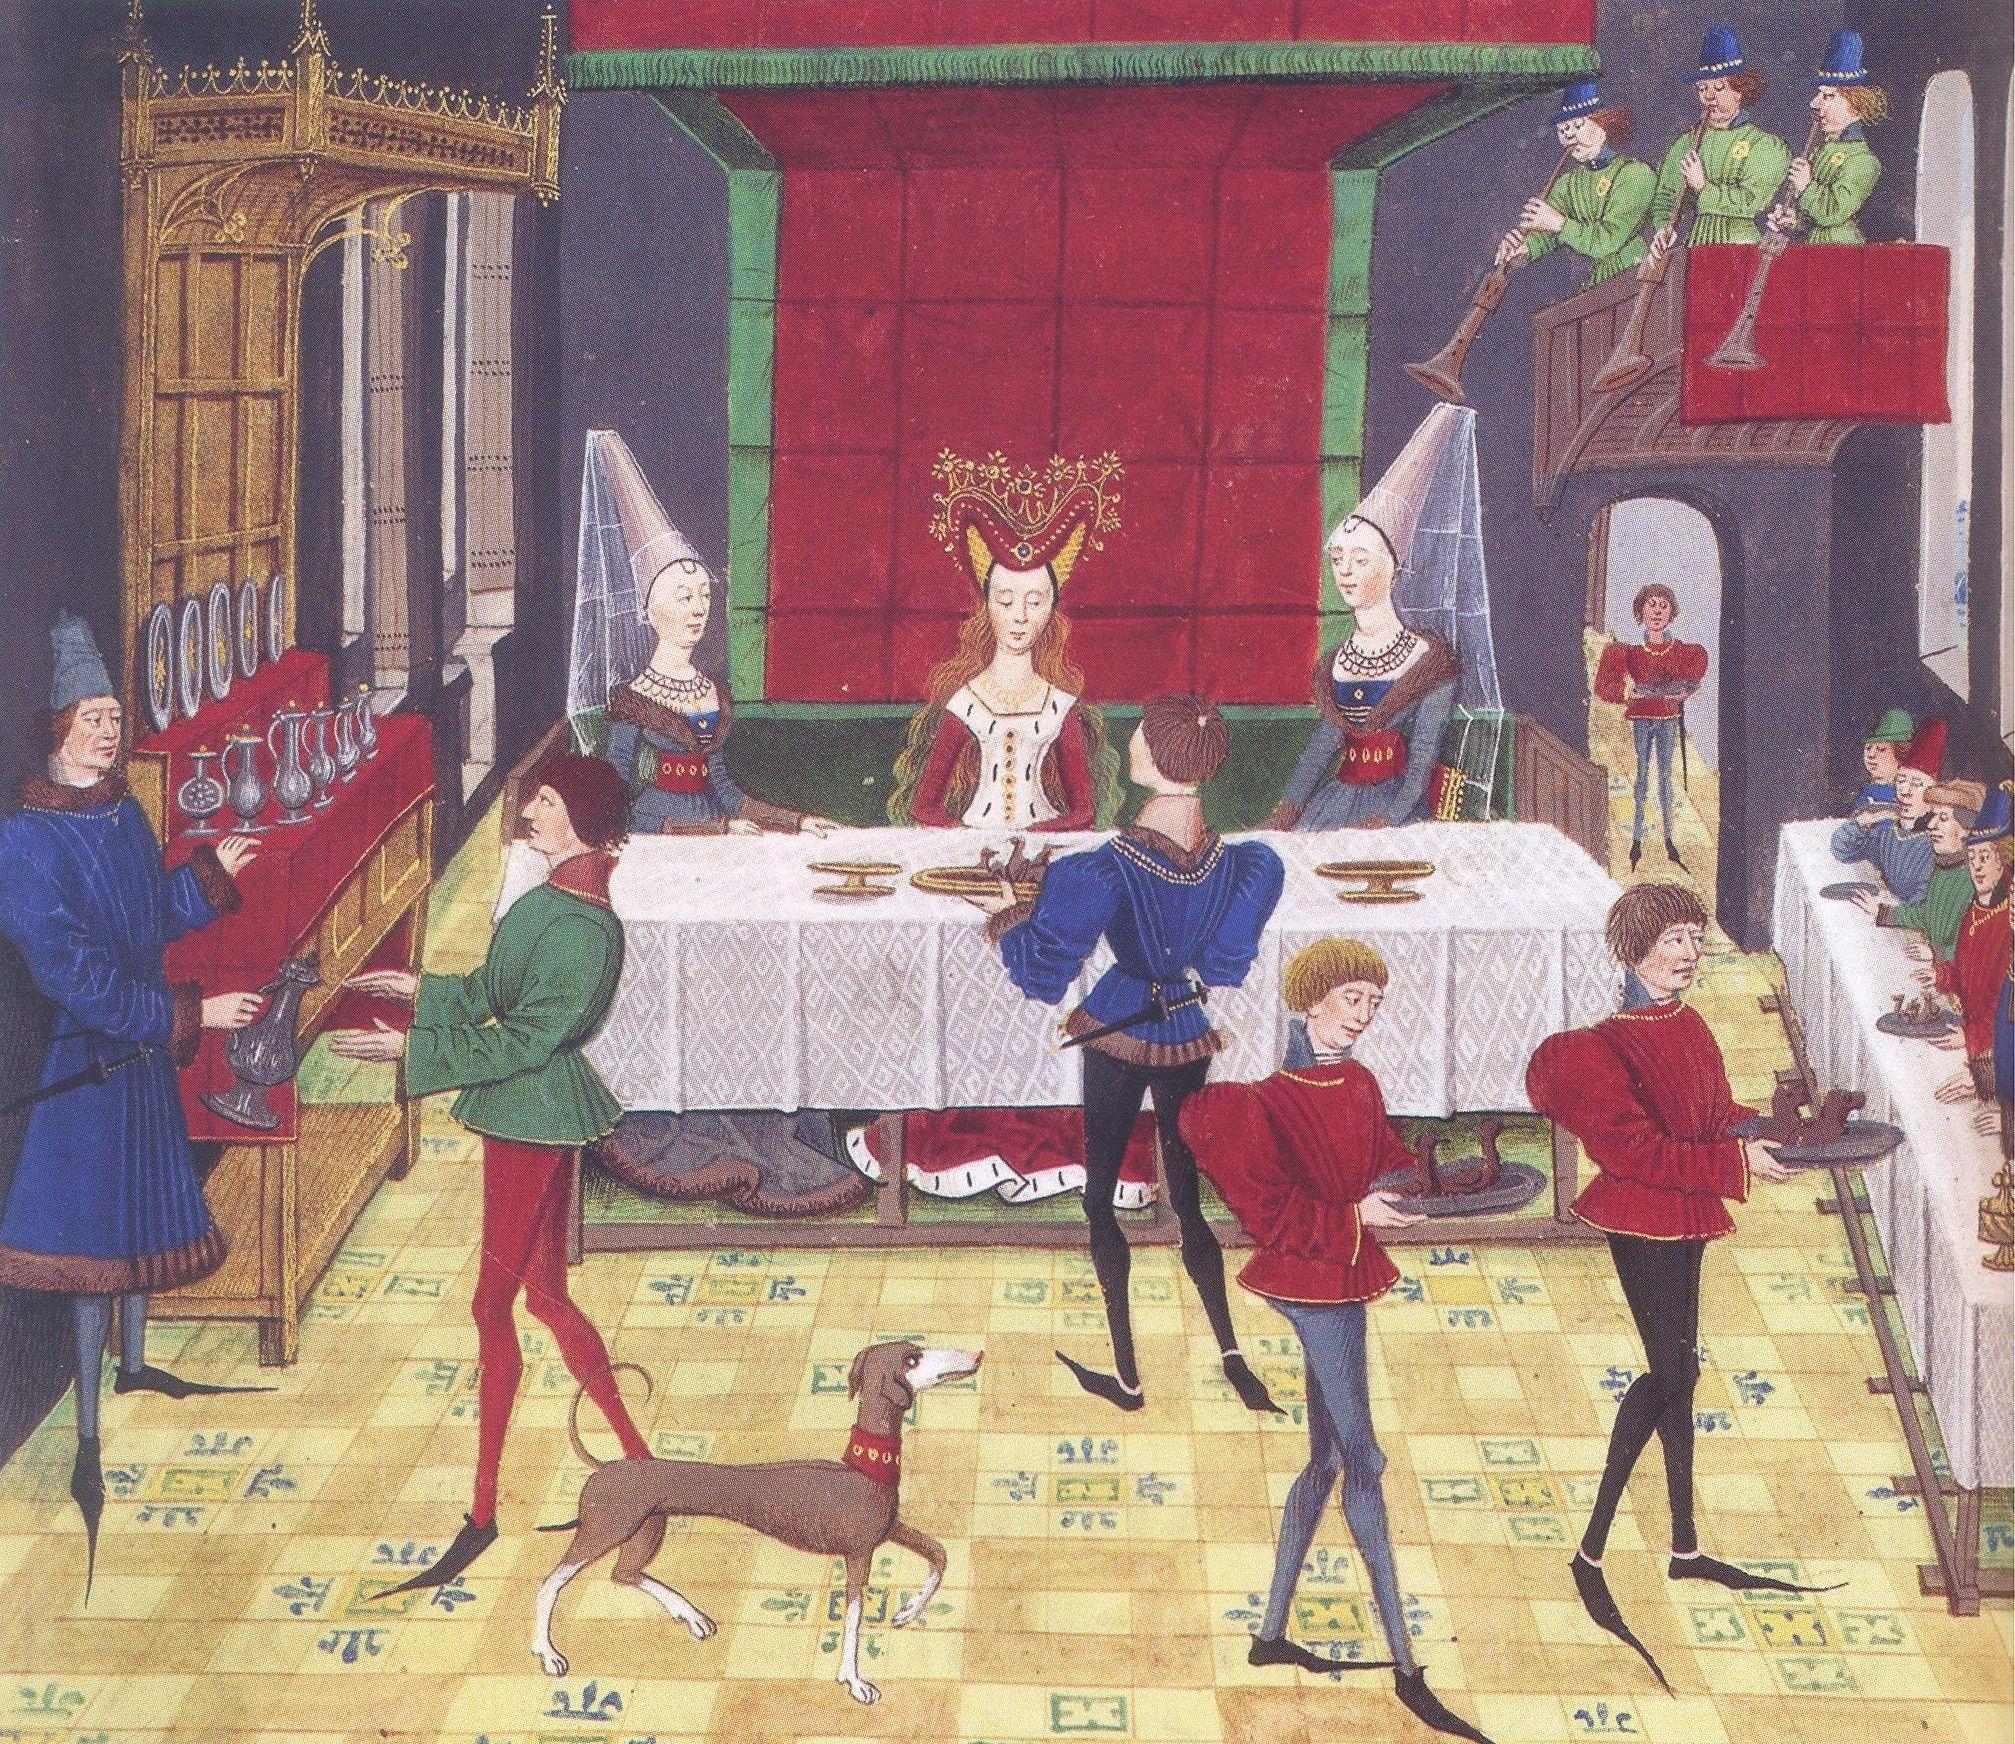 Repas de noce Histoire de Renaud de Montauban, Bruges, 1468-1470 Paris, BnF, Arsenal, manuscrit 5073 fol. 148